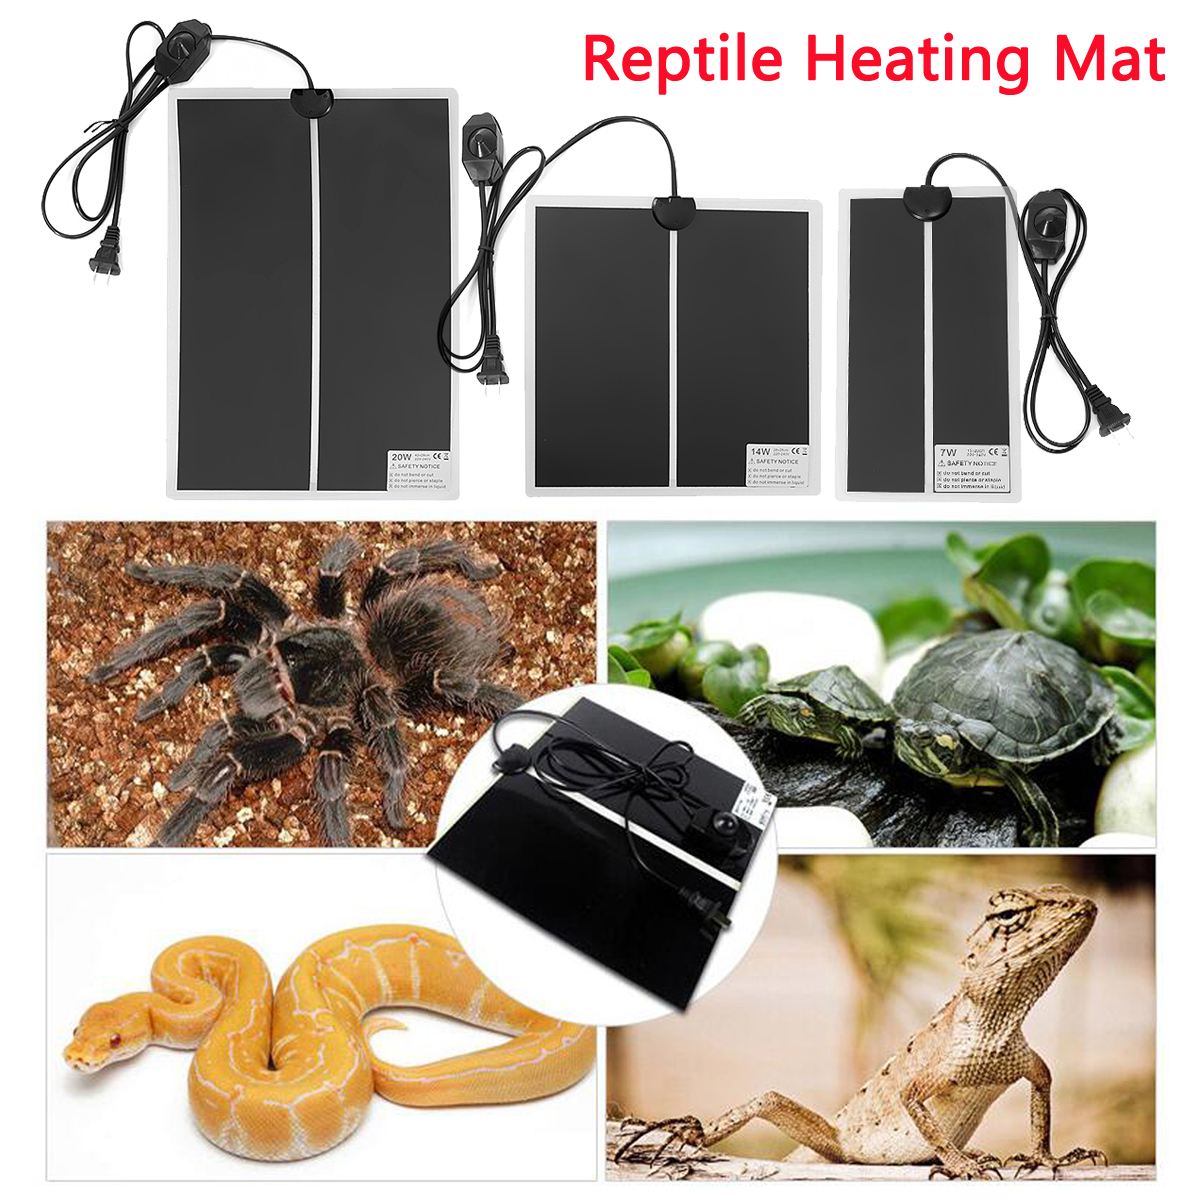 Angemessen 220 V Reptil Grübler Inkubator Haustier Heizkissen Wärme Matte Schlange Eidechse Tragbare Elektronische Heizung Matten 7 Watt/14 Watt/20 Watt Attraktive Mode